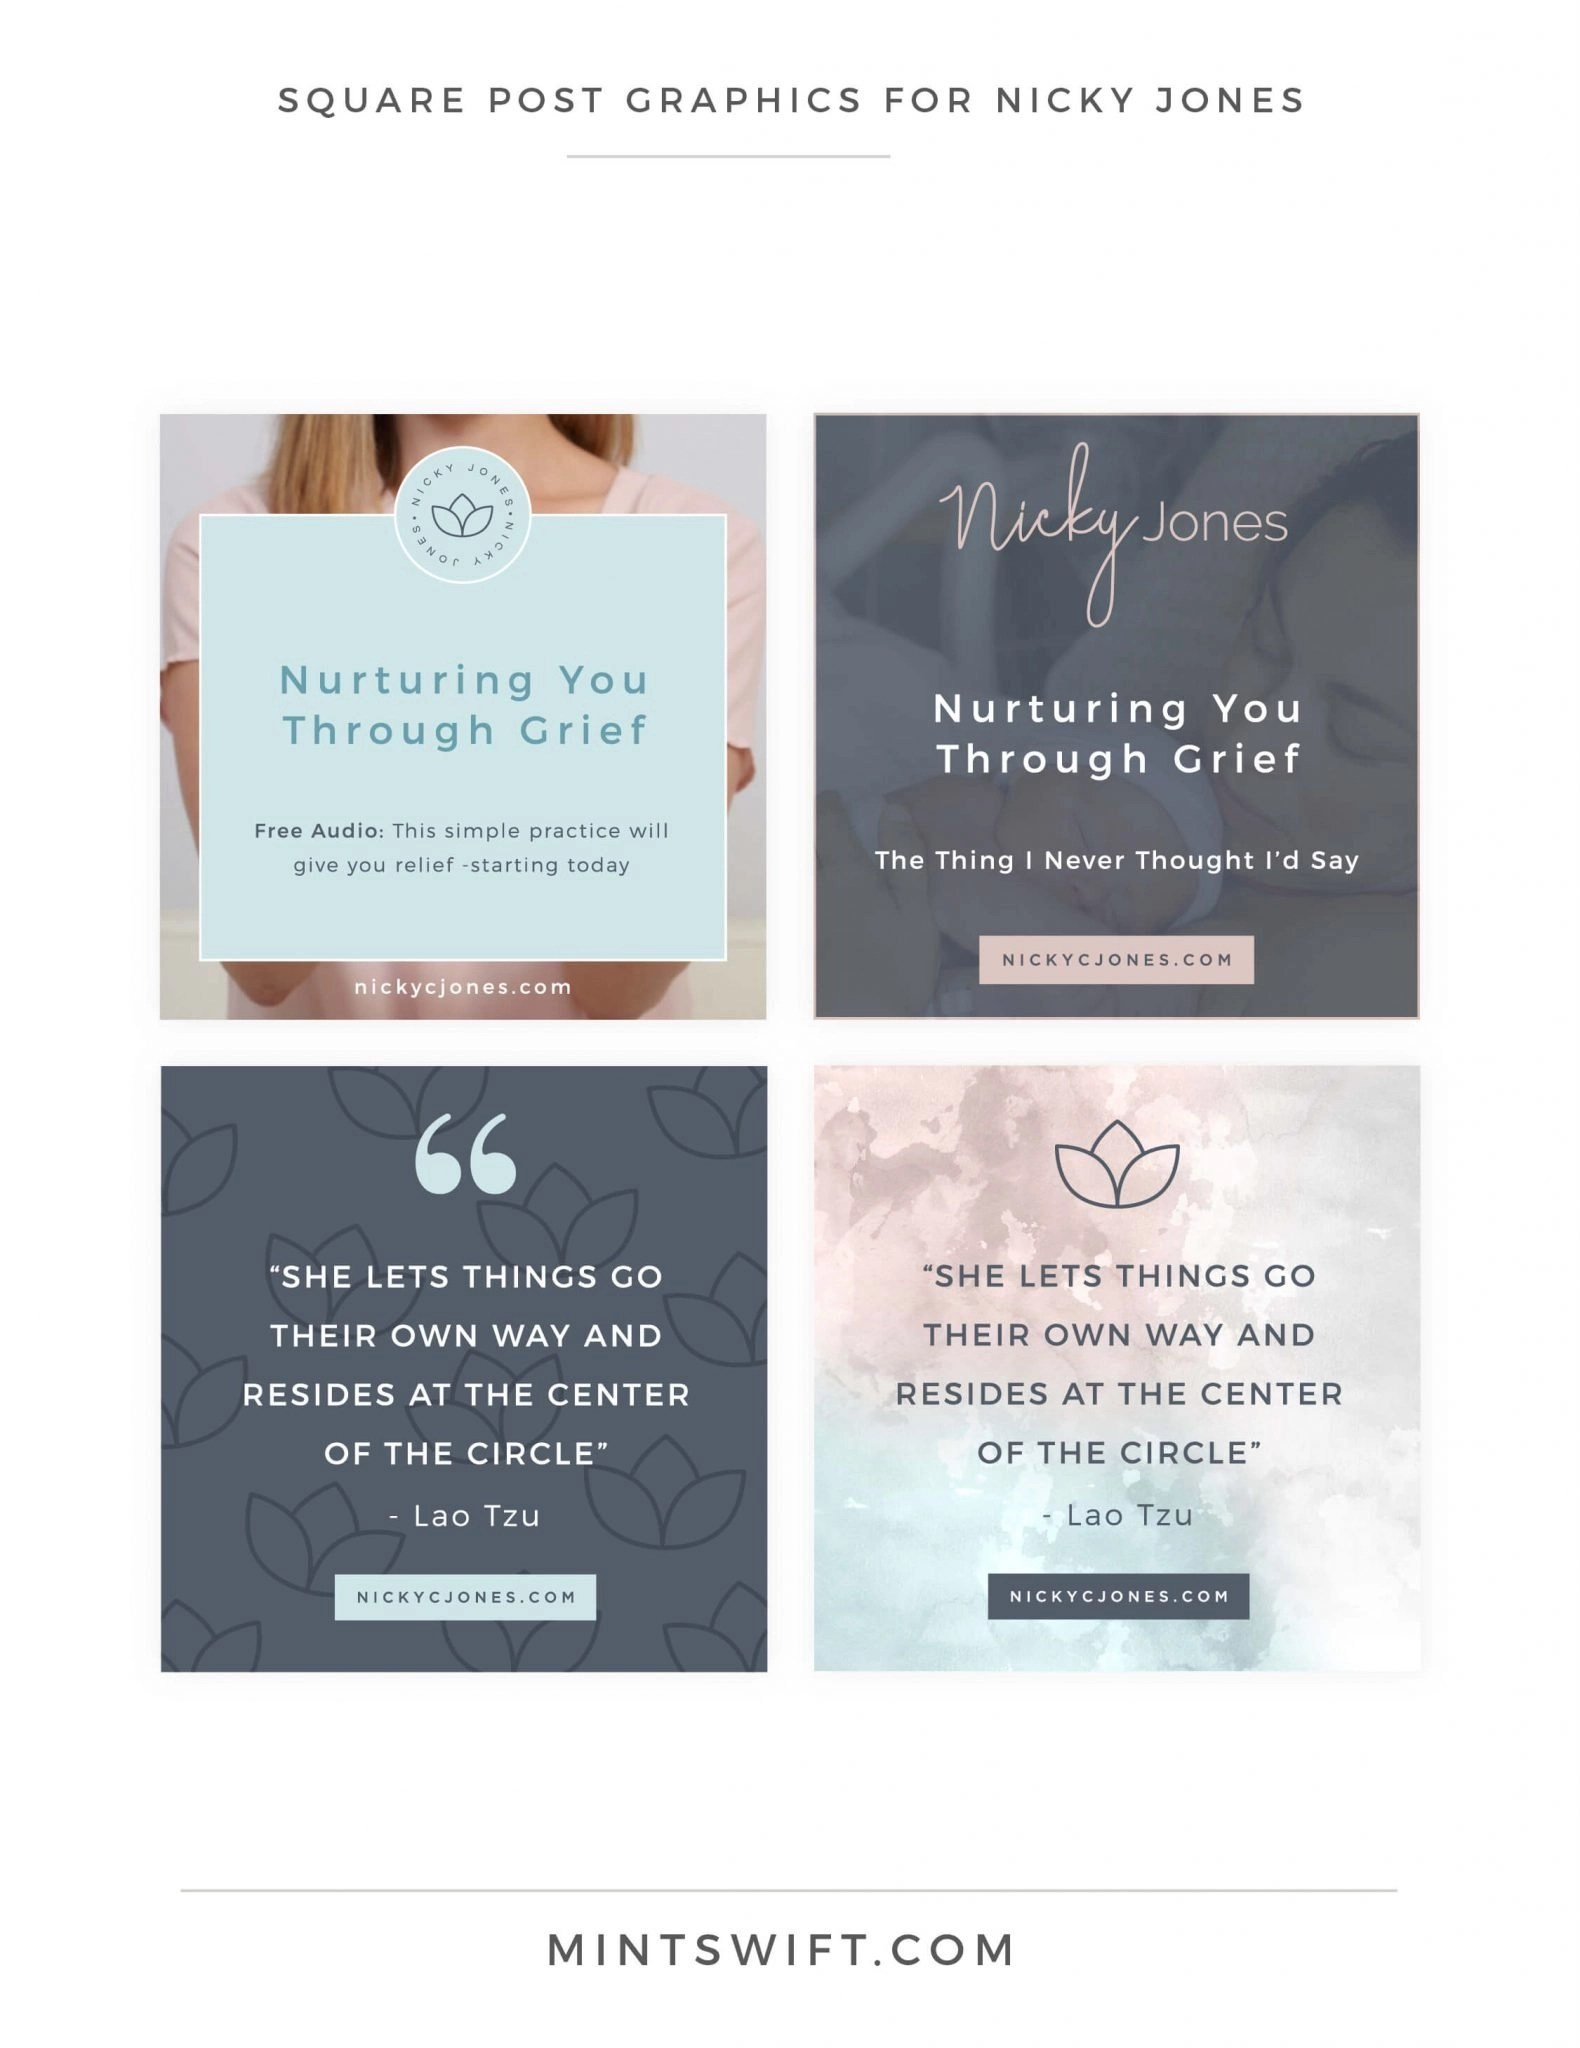 Nicky Jones - Square Post Graphics - Brand Design Package - MintSwift